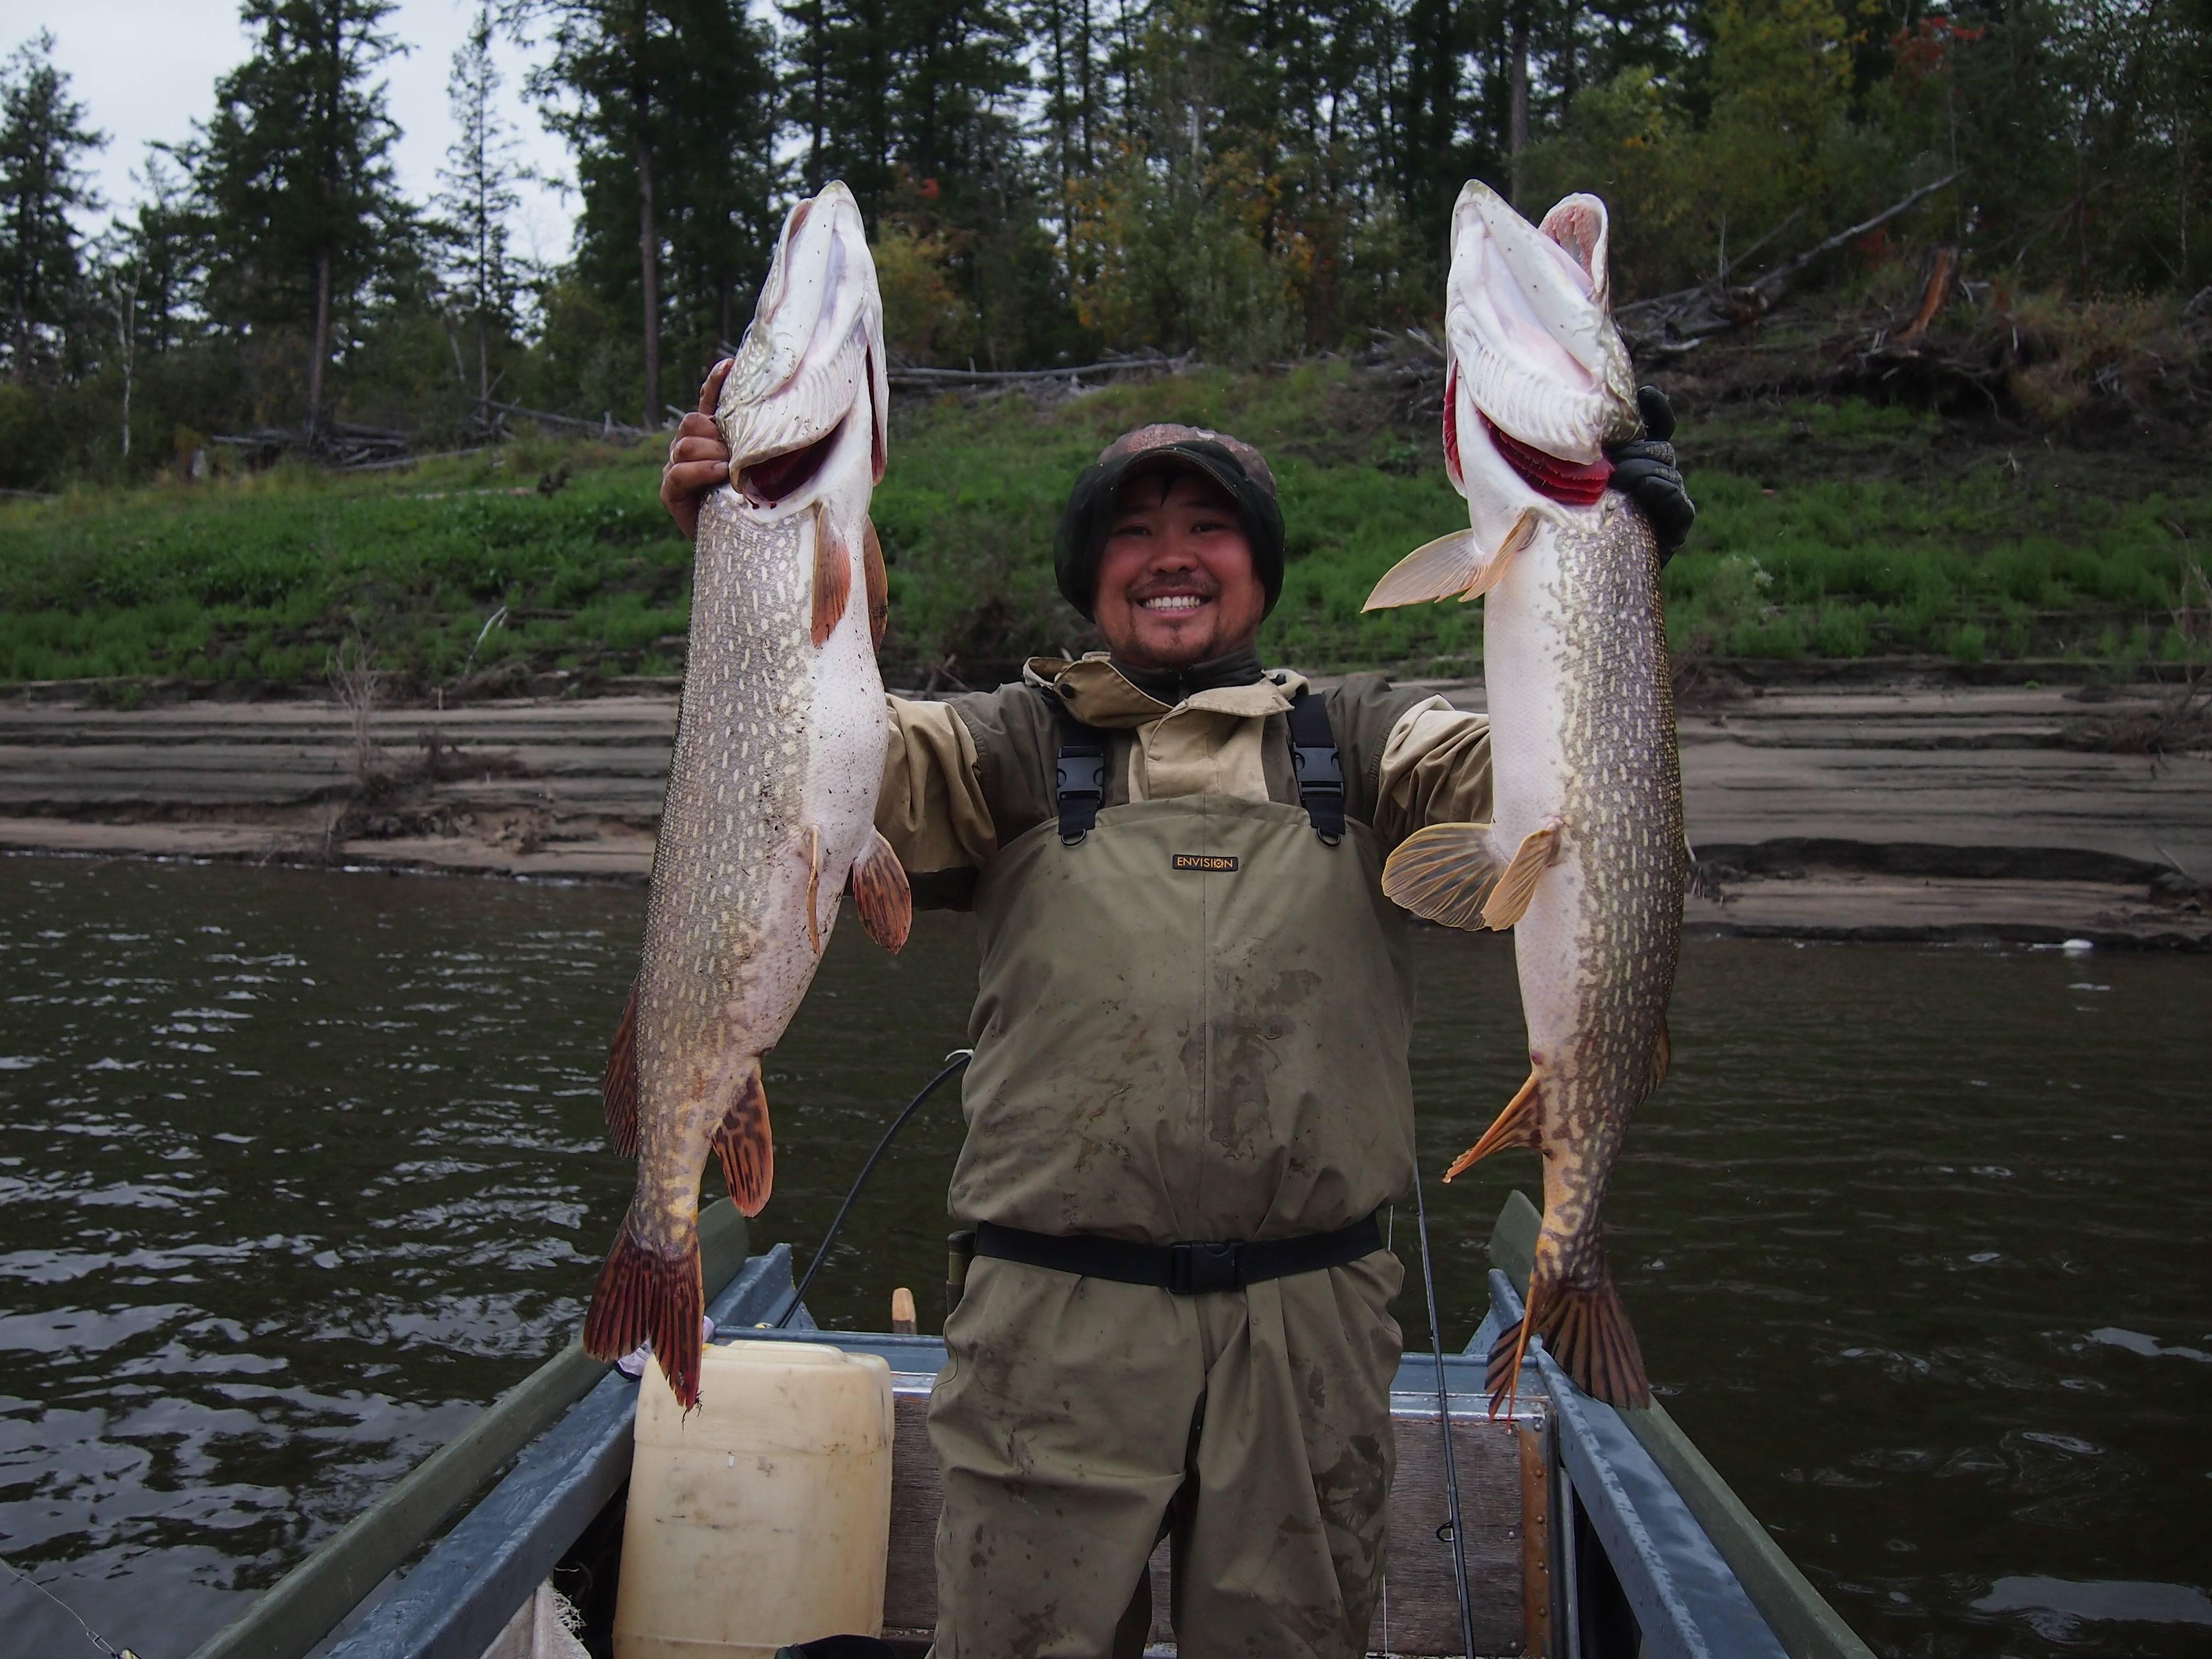 Река лена — описание, география, природа, рыбалка, фото и видео